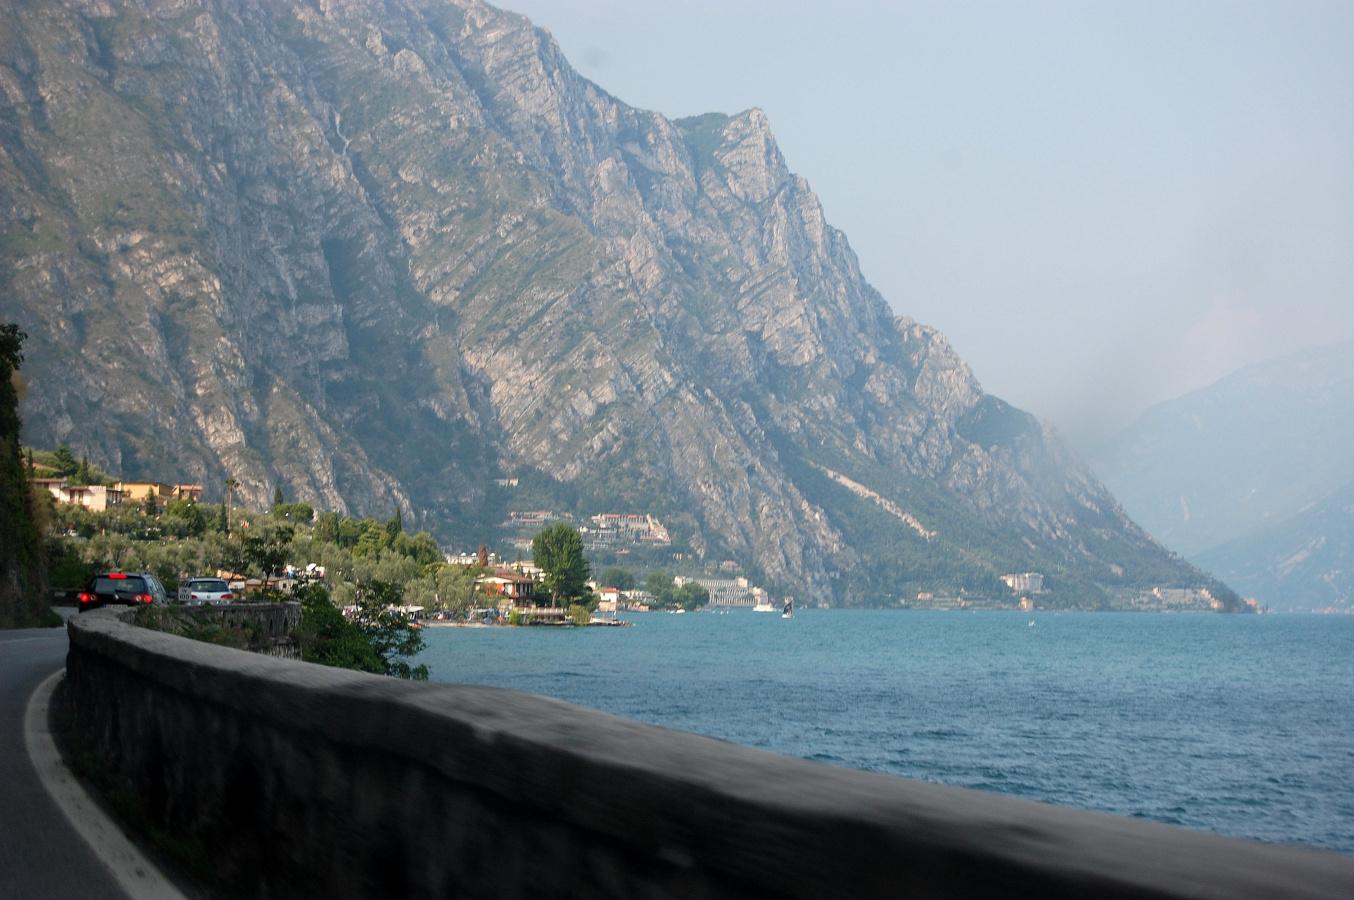 Obr. 7-1 silnice na levém břehu Lago di Garda